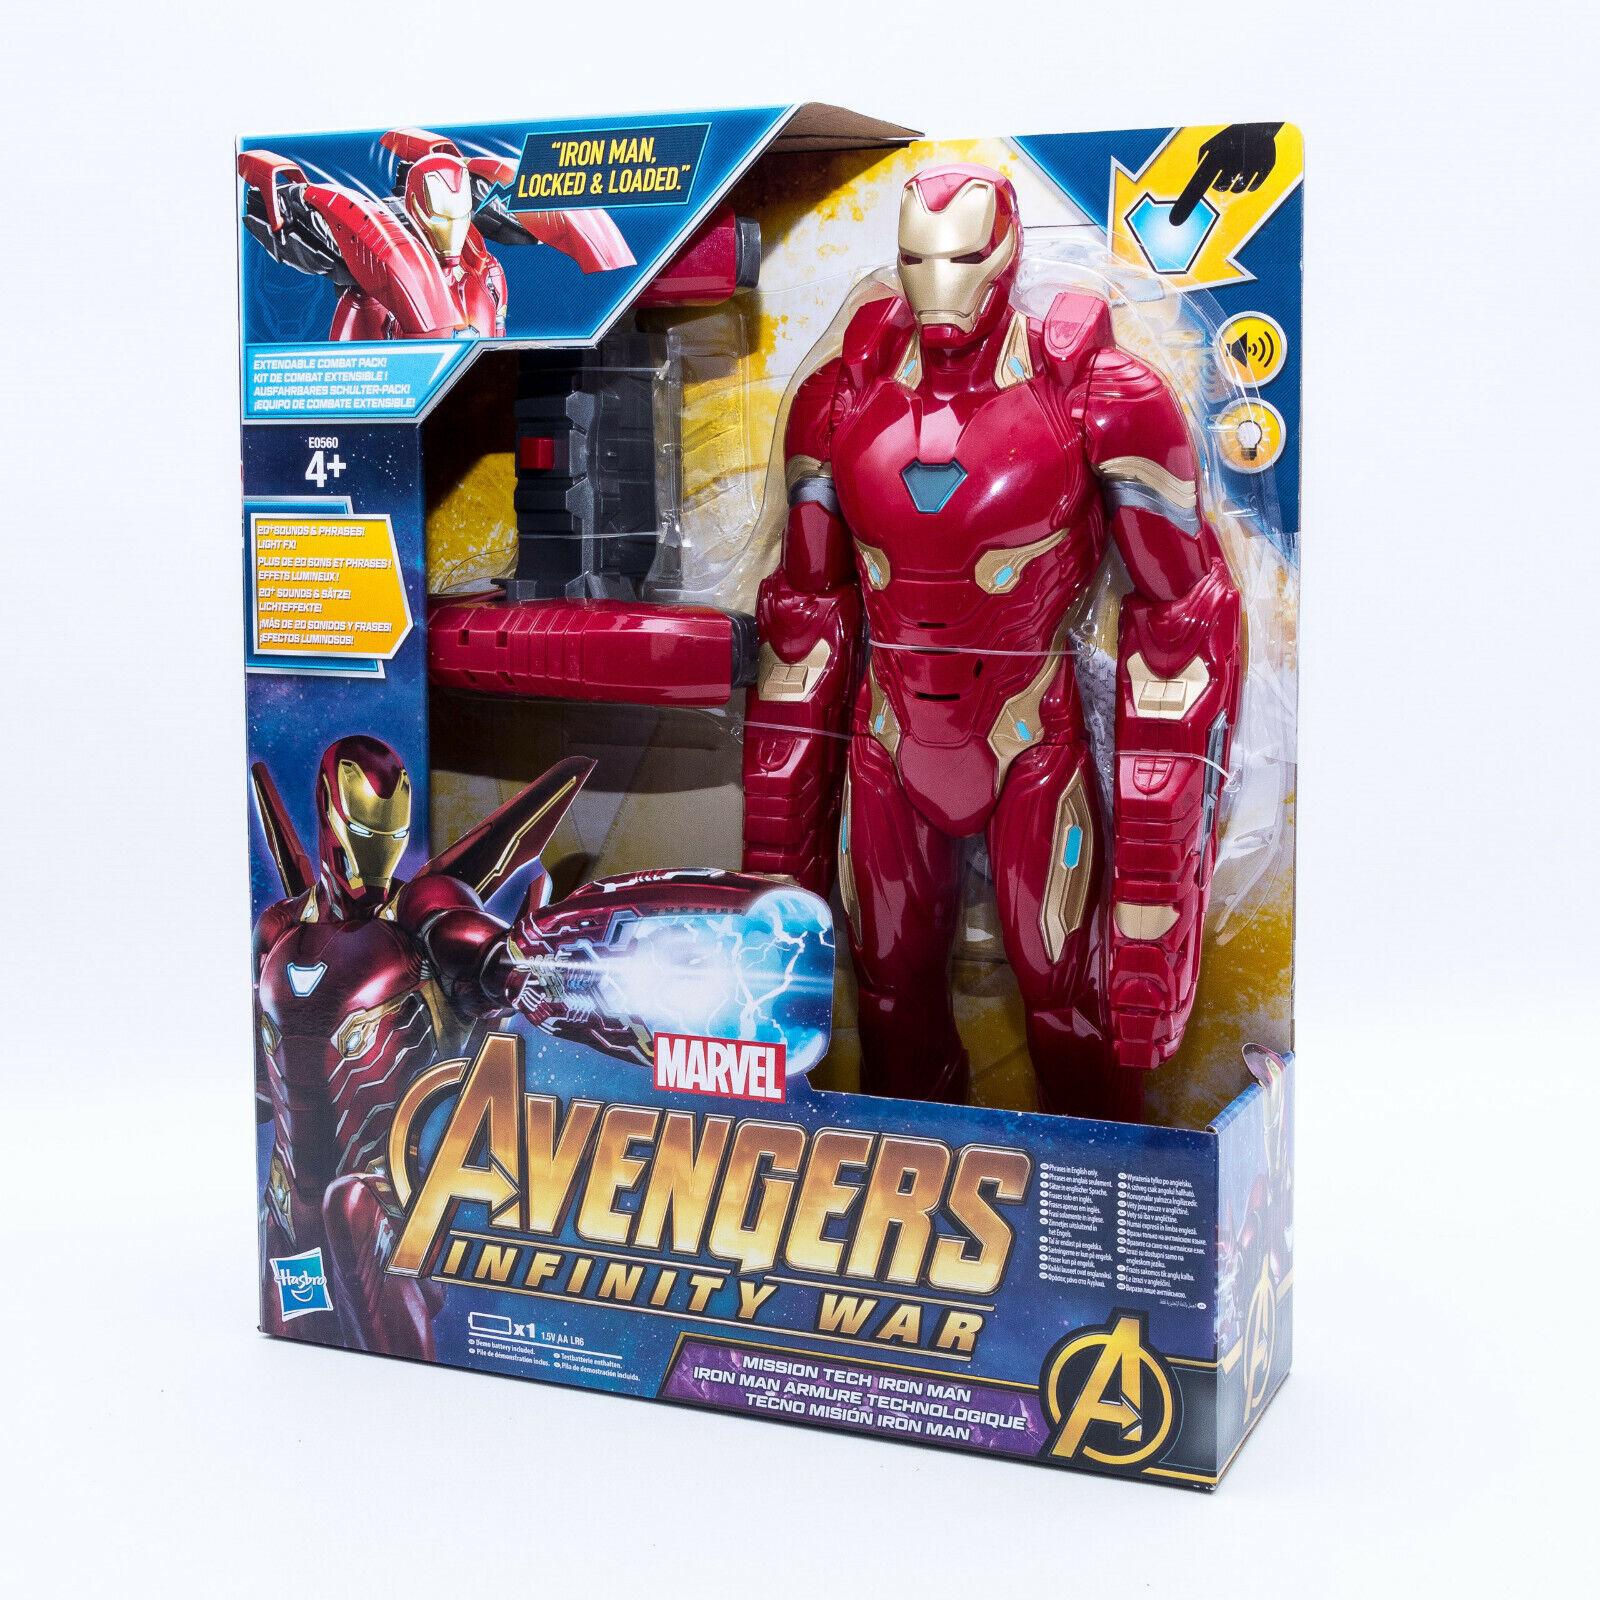 Hasbro E0560 Marvel Avengers Infinty War Ironman Actionfigur 35 cm. mit Sound  | Angemessener Preis